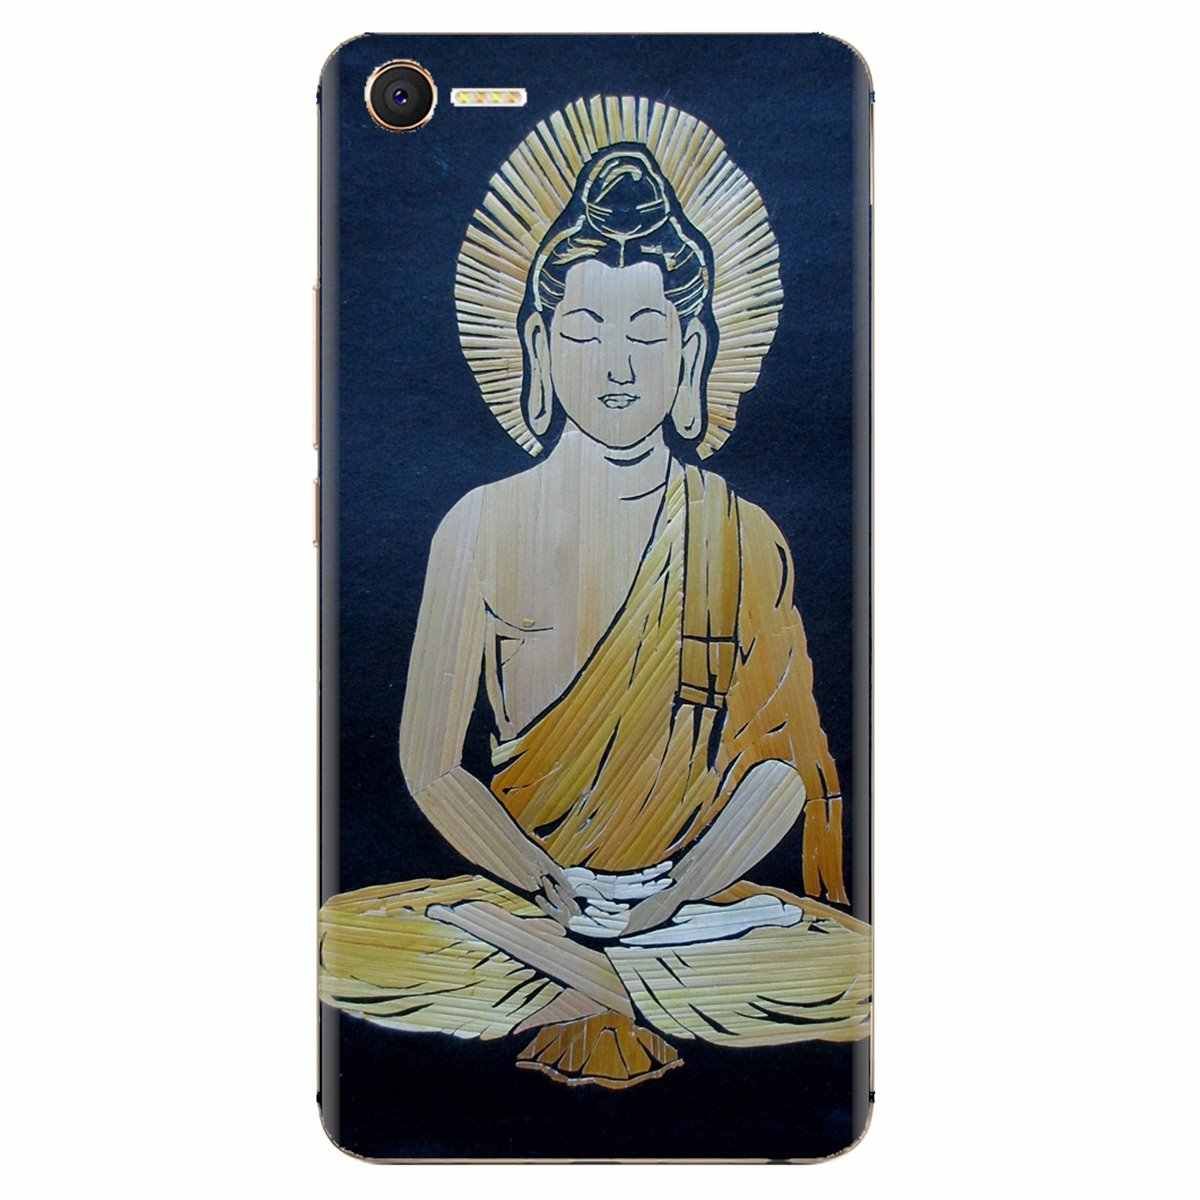 Cubierta del teléfono de silicona bolso para Samsung Galaxy J1 J2 J3 J4 J5 J6 J7 J8 Plus 2018 primer 2015 de 2016 retro 2017 galáctico Gautama Buda.